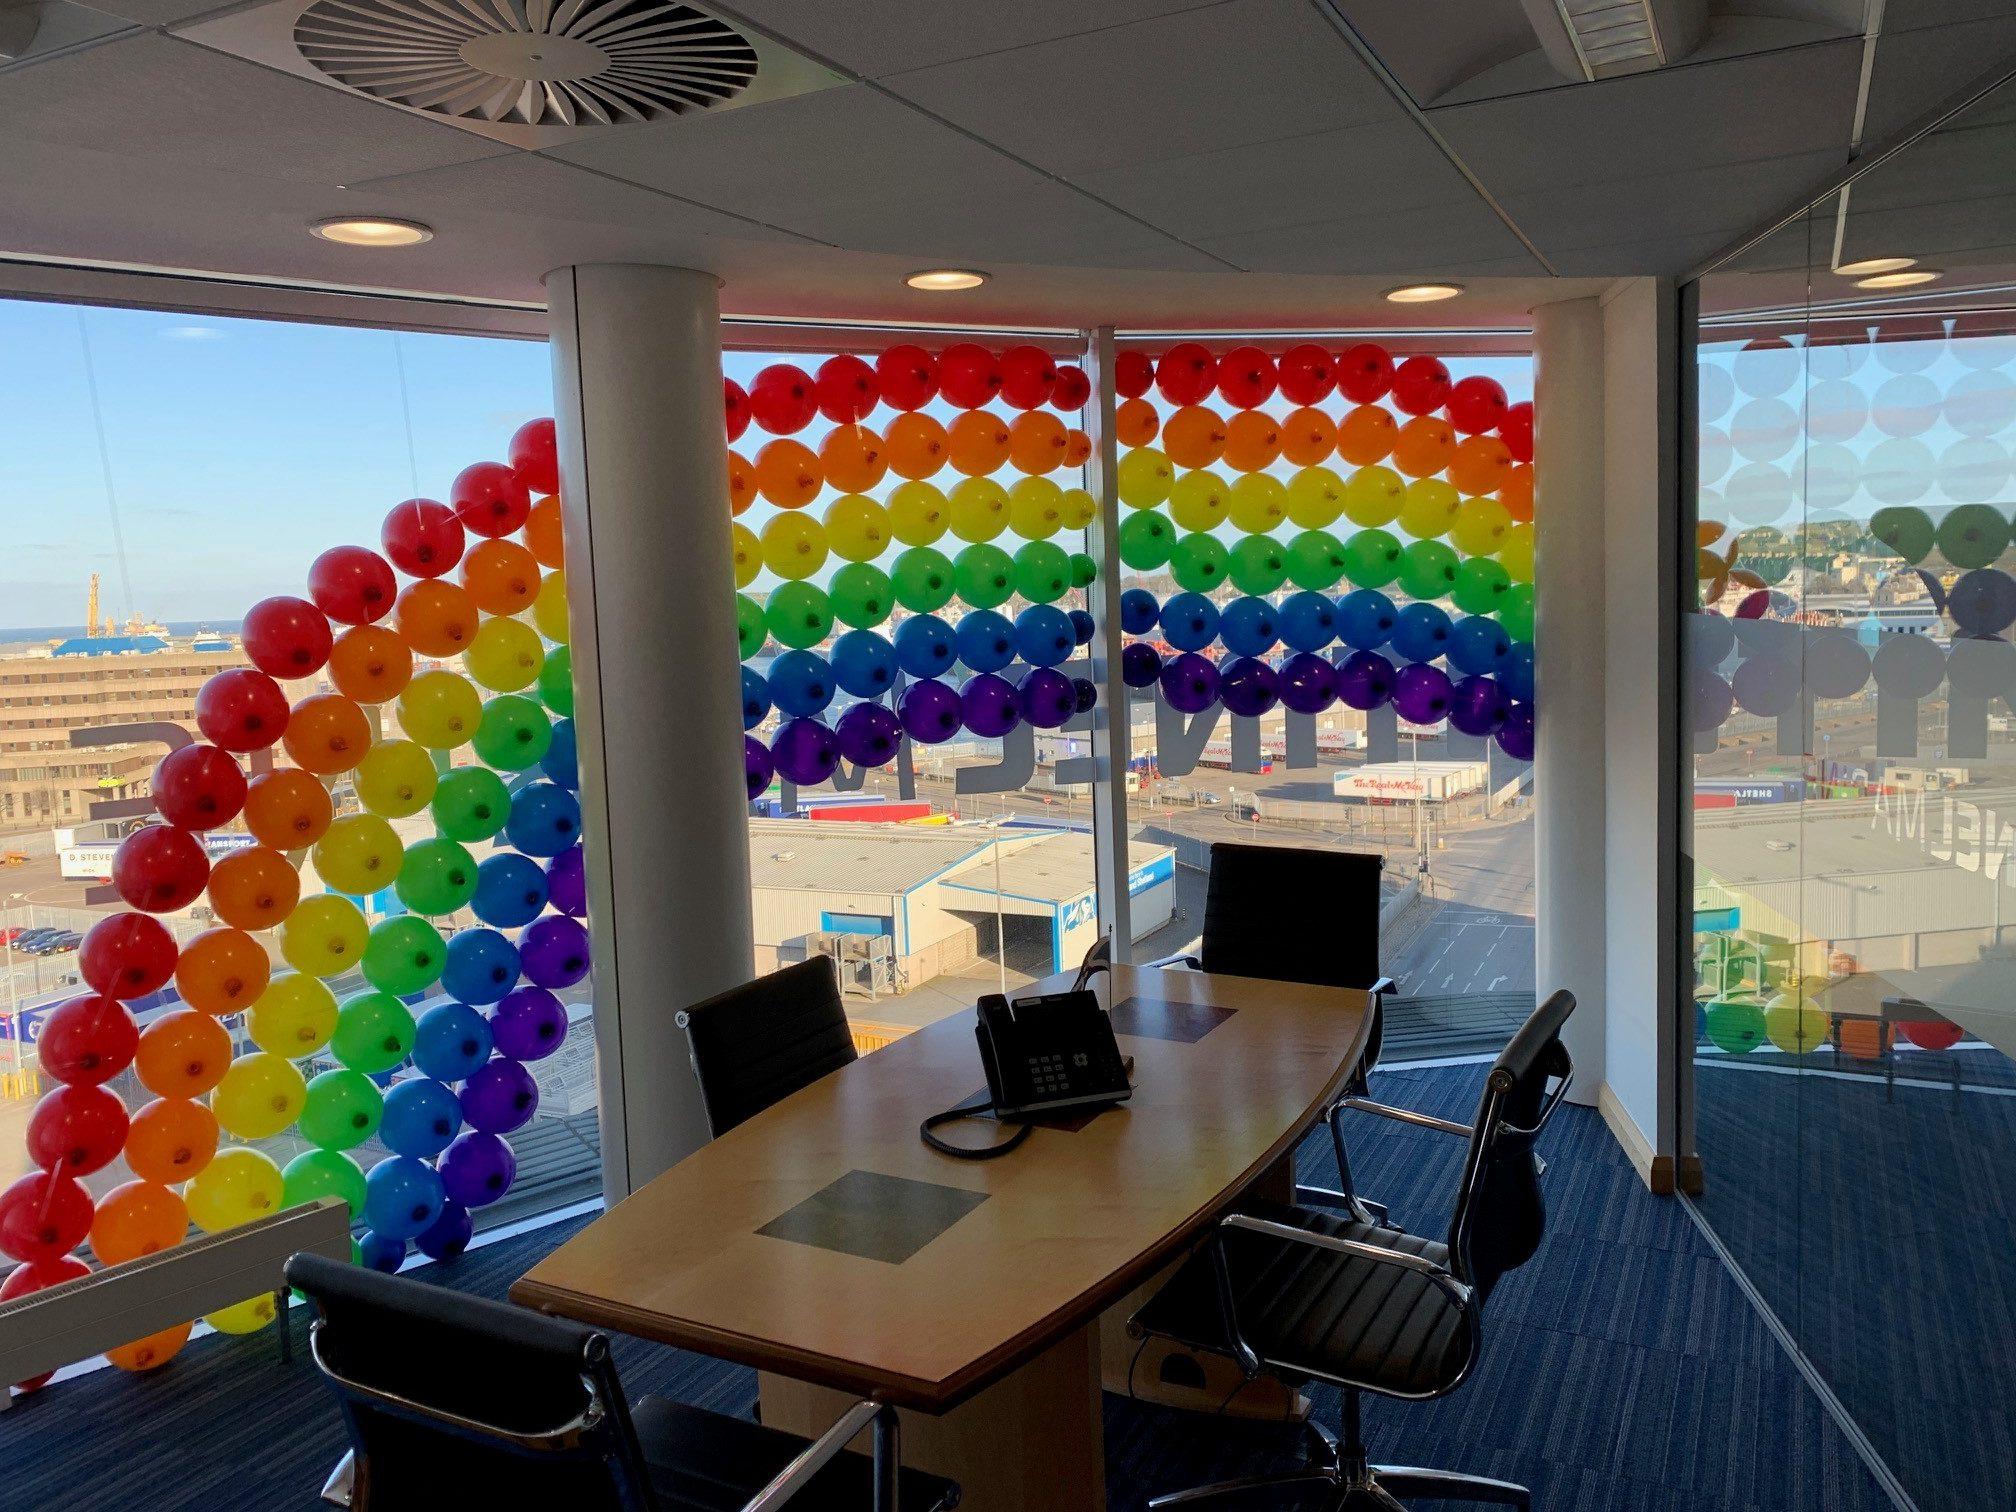 The rainbow art